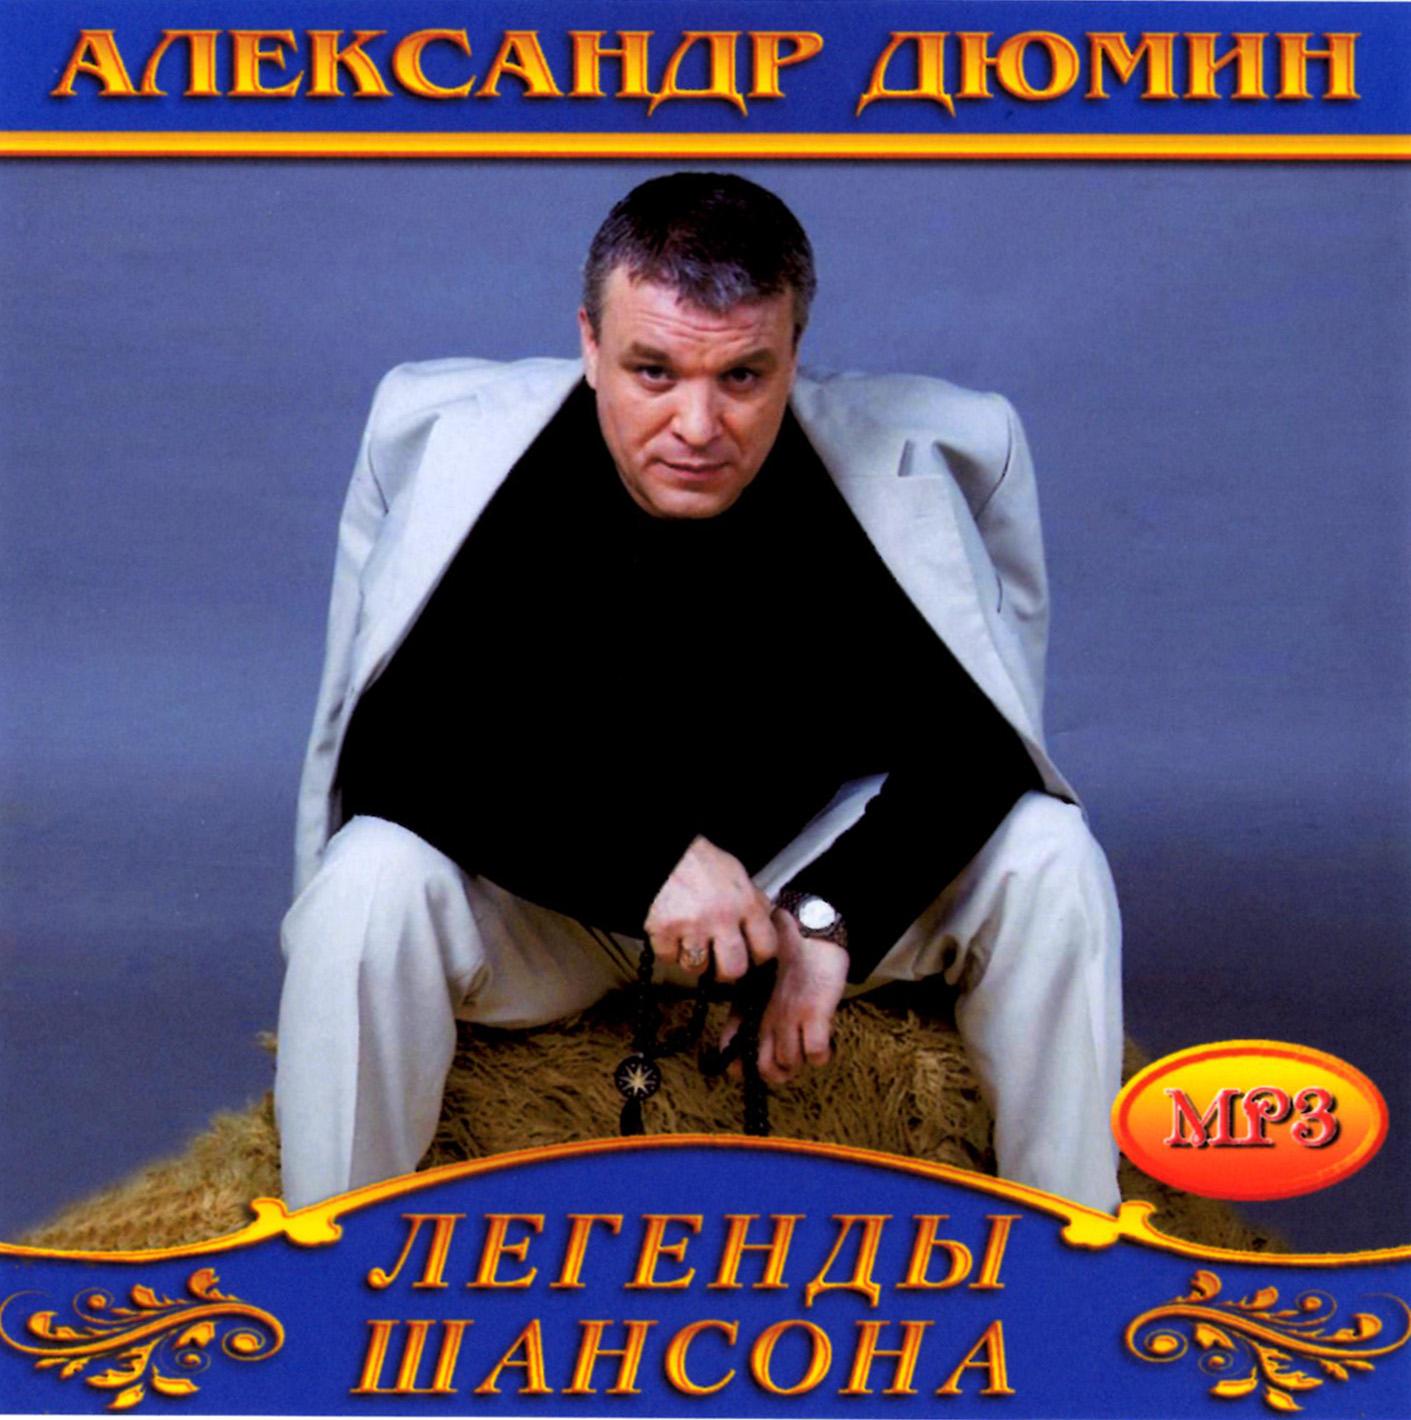 Александр Дюмин [mp3]